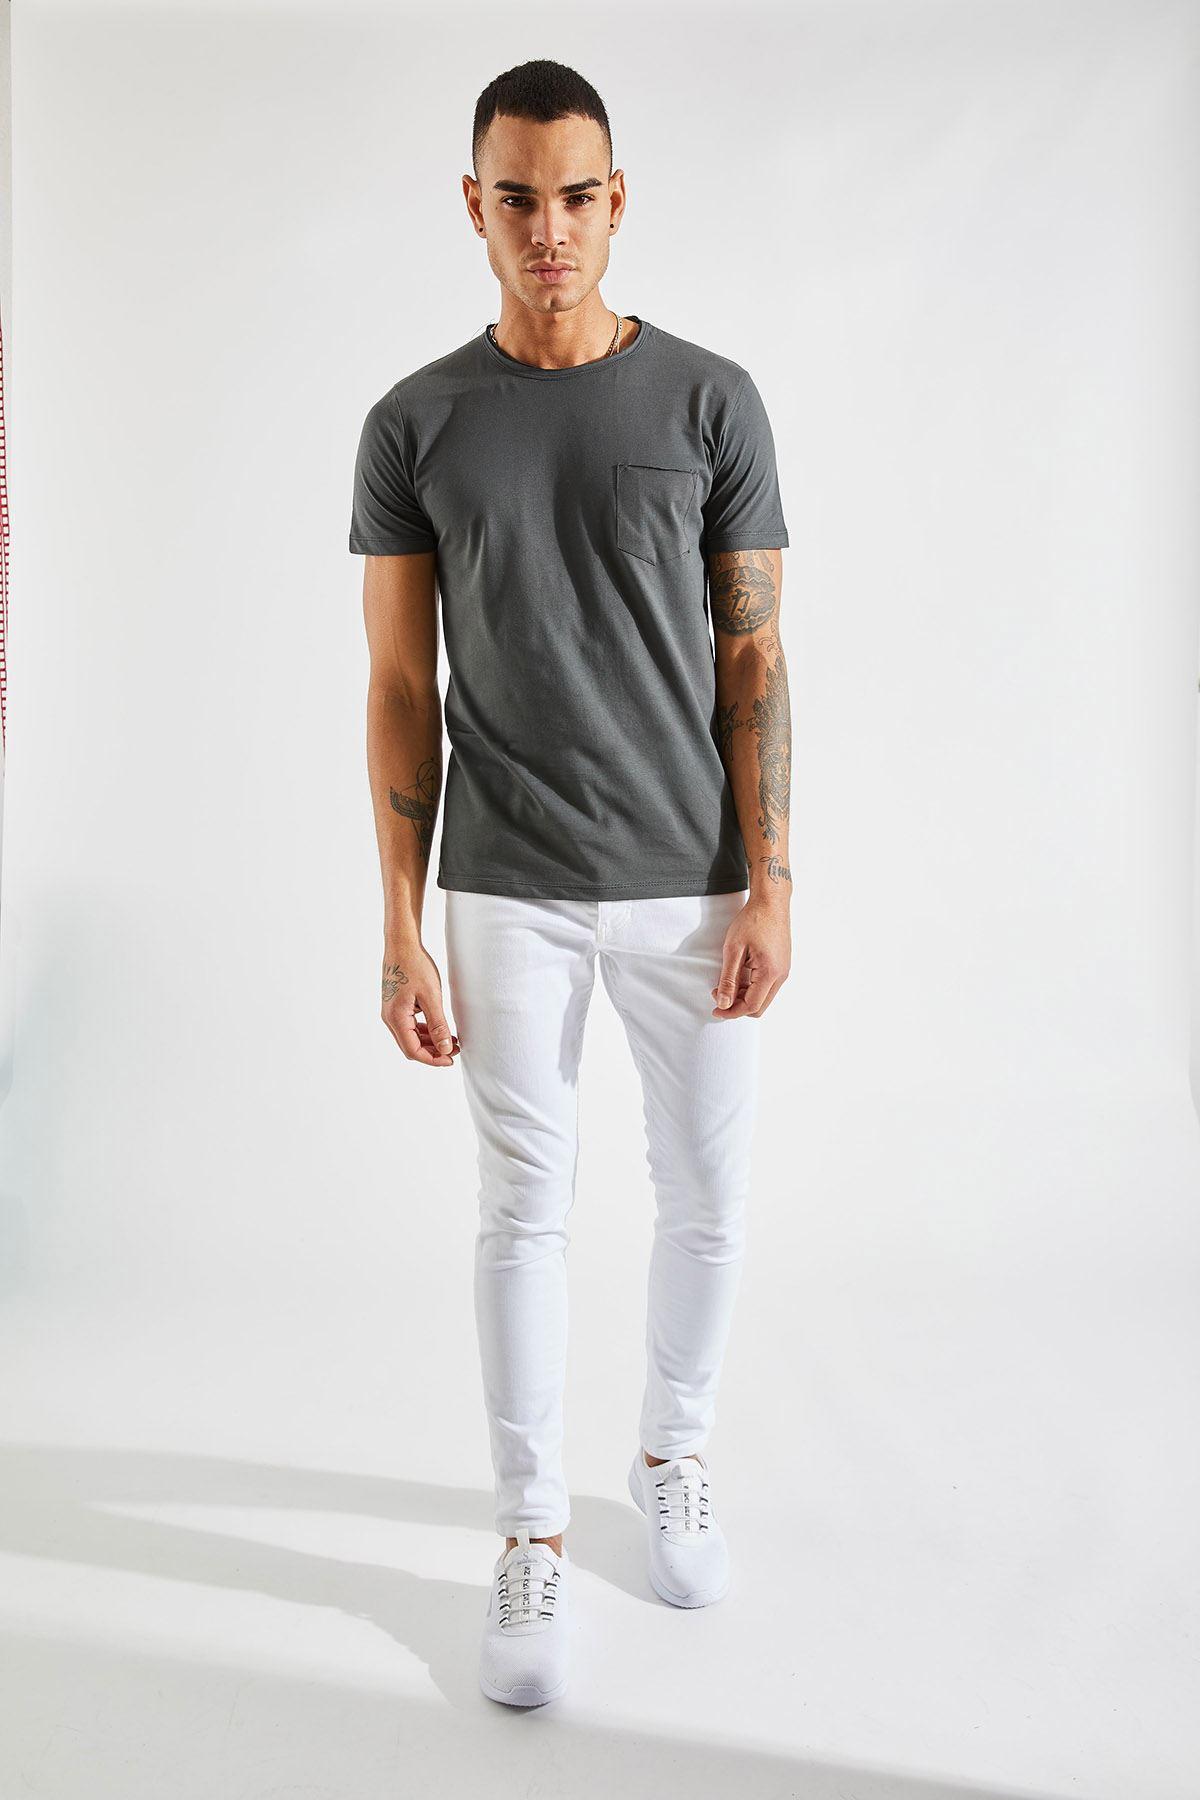 Bisiklet Yaka Cepli Füme Erkek T-Shirt